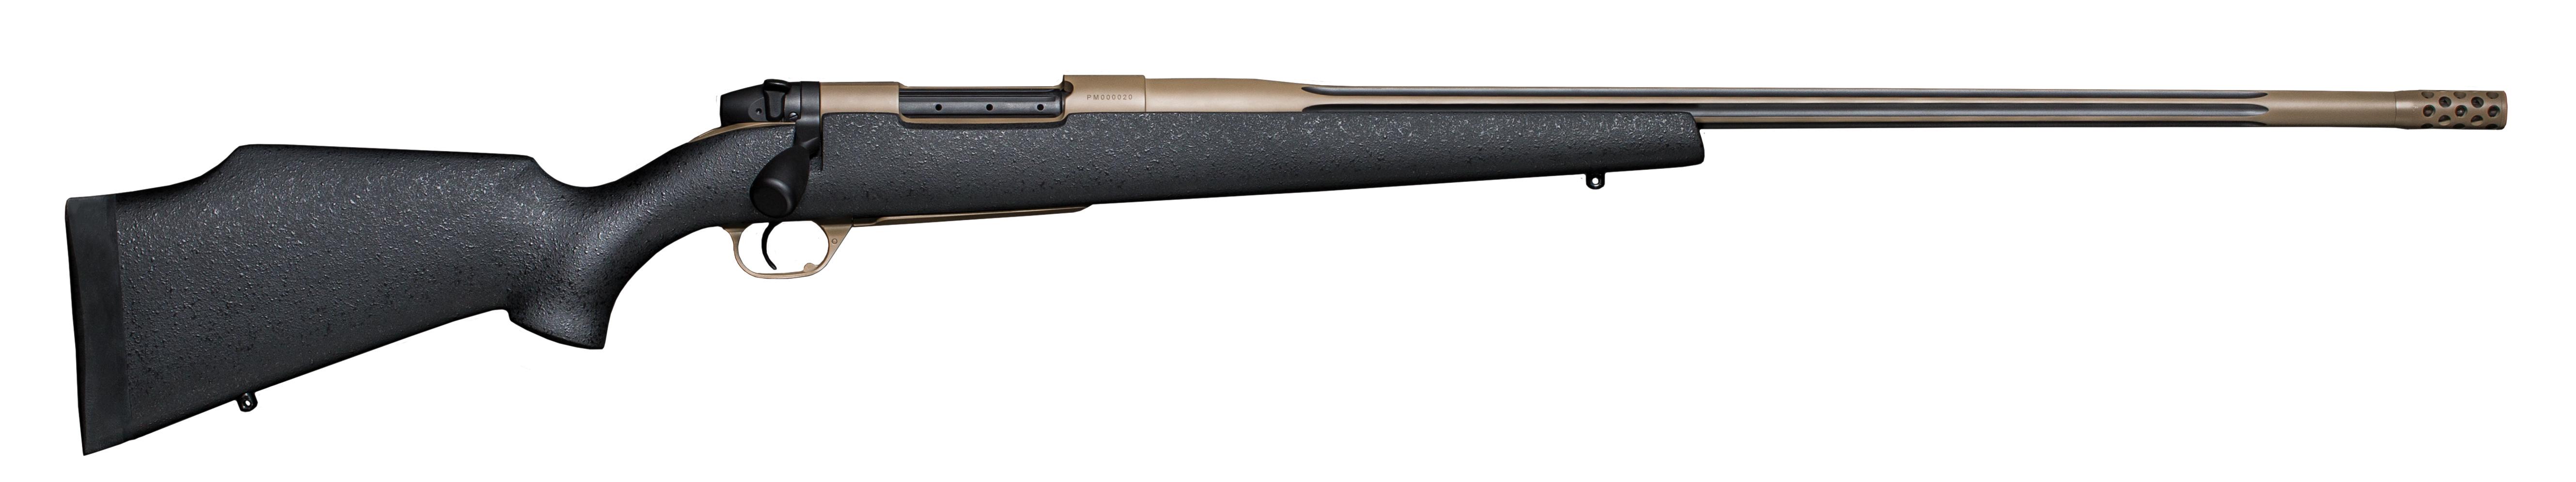 Mark V Krieger Custom Rifle (KCR)